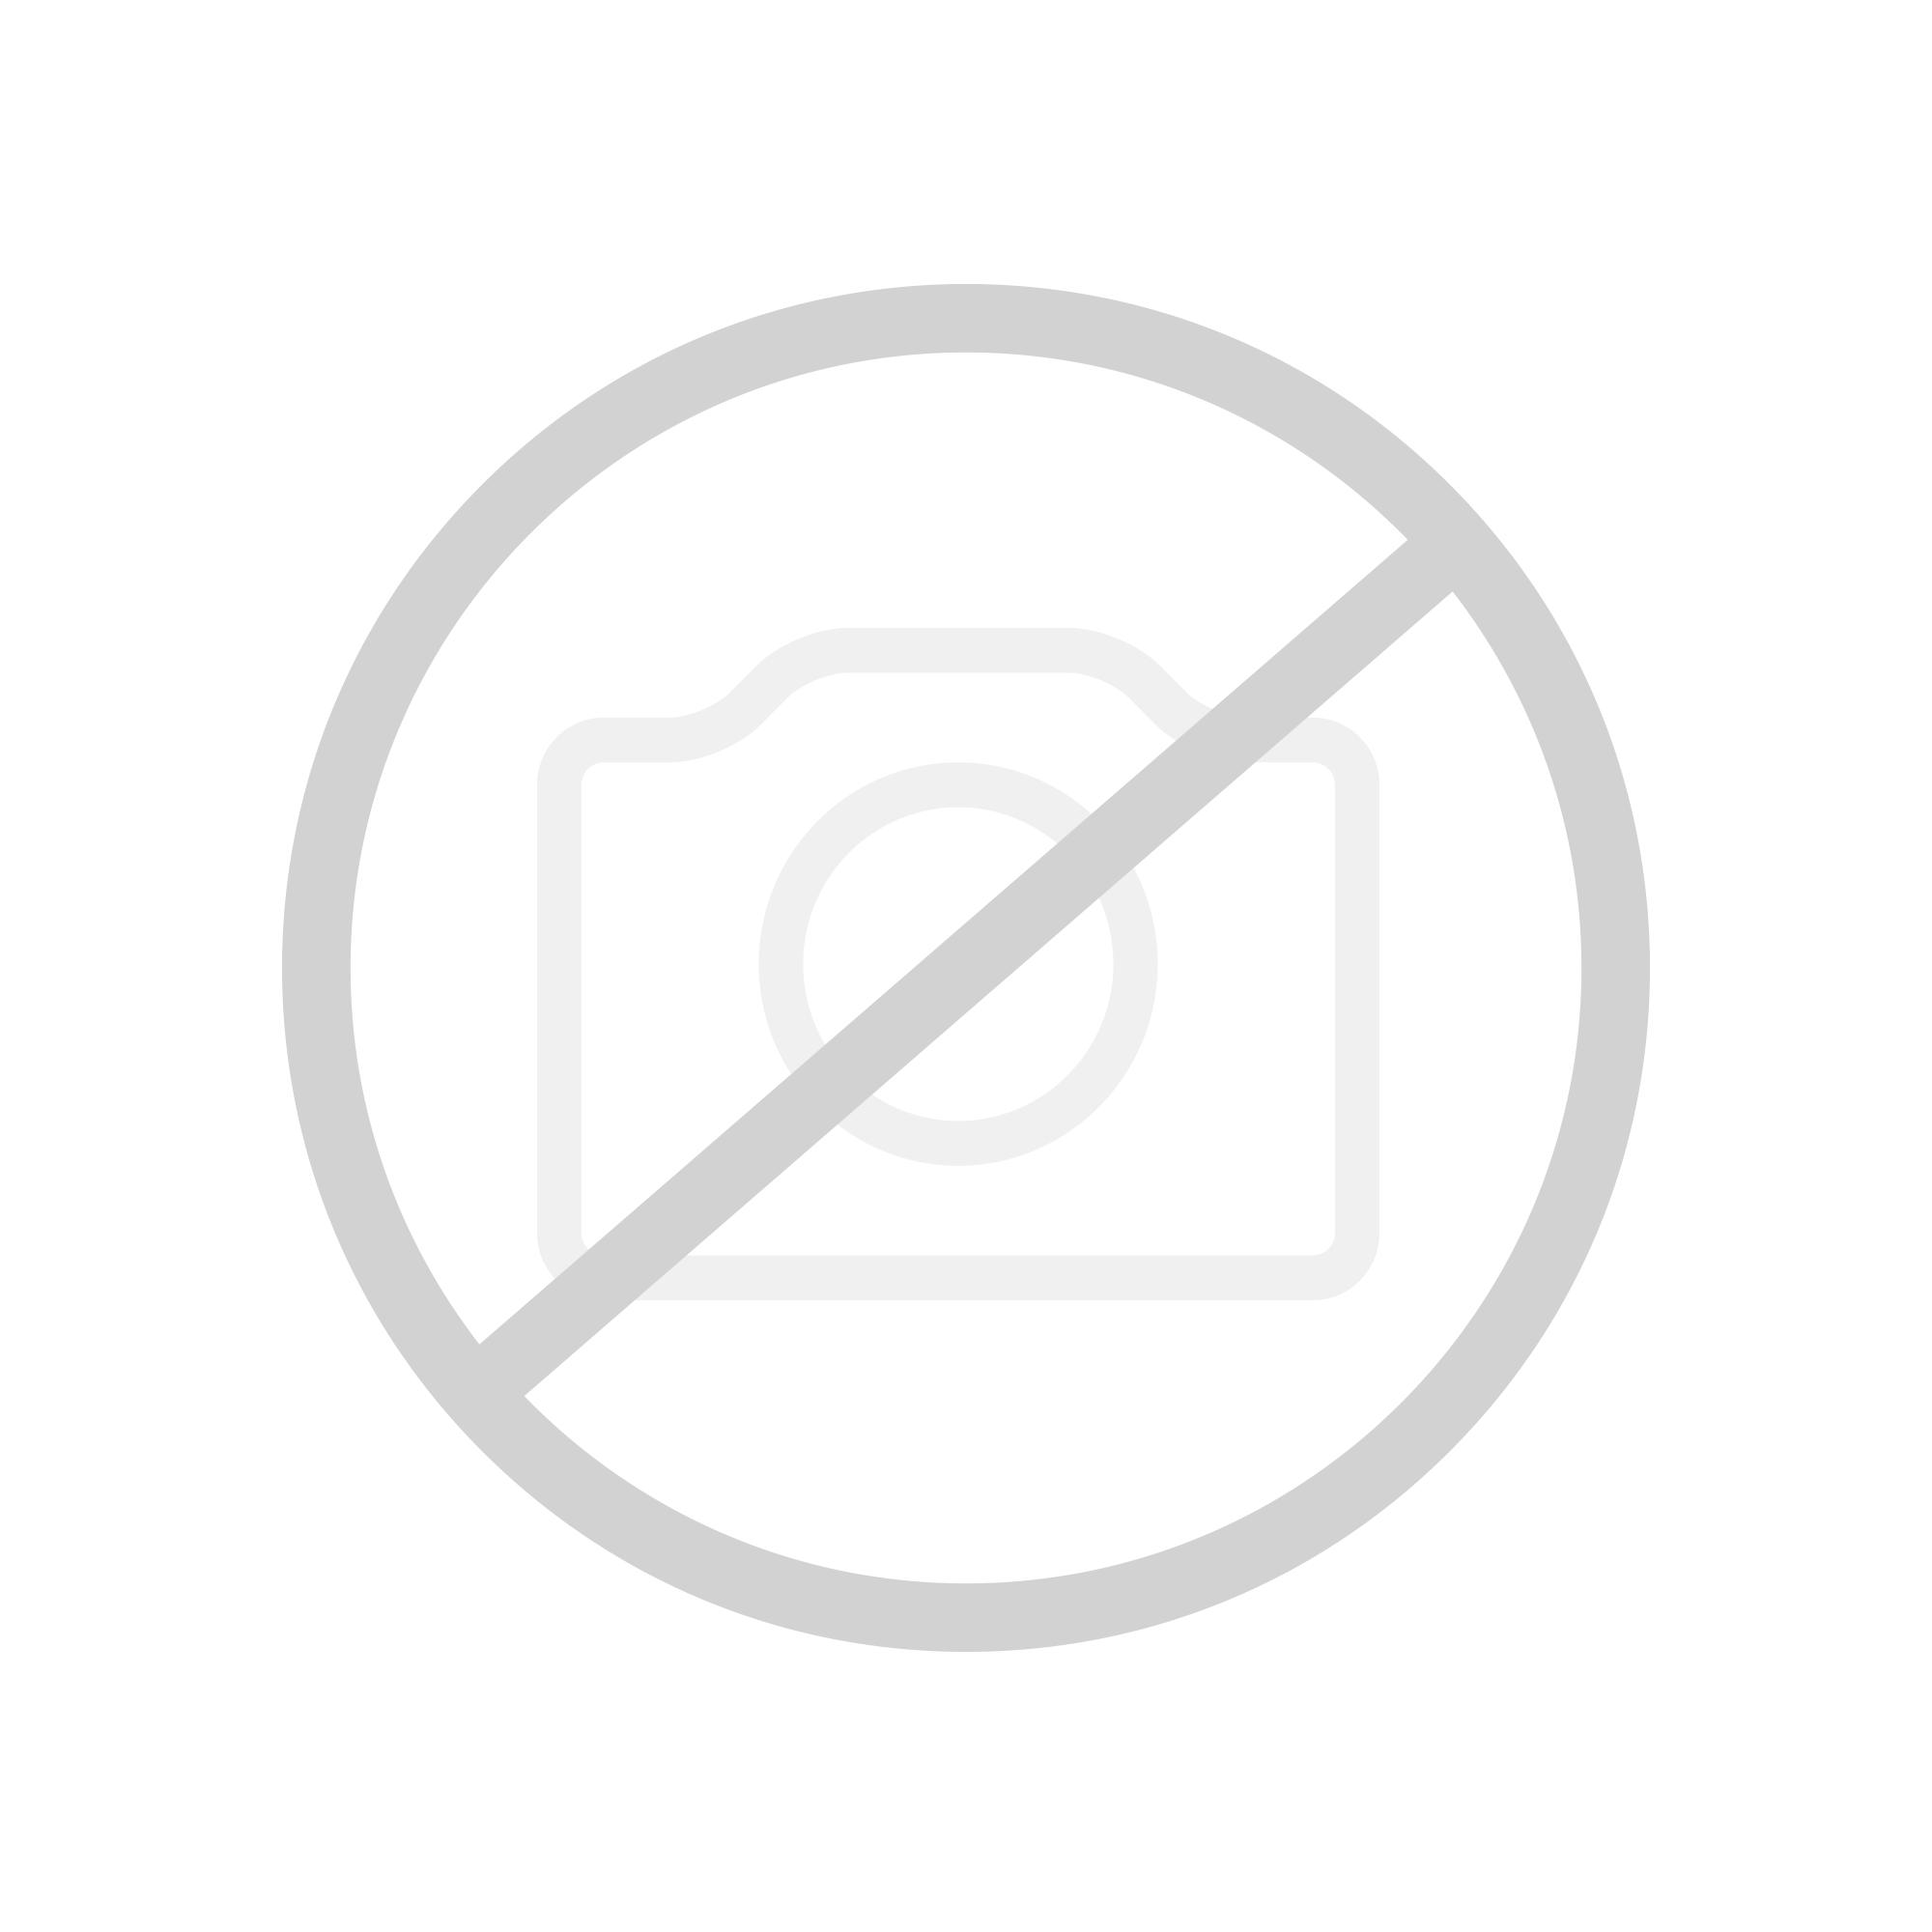 Keuco EDITION 11 Handtuchhalter, 1-teilig, feststehend